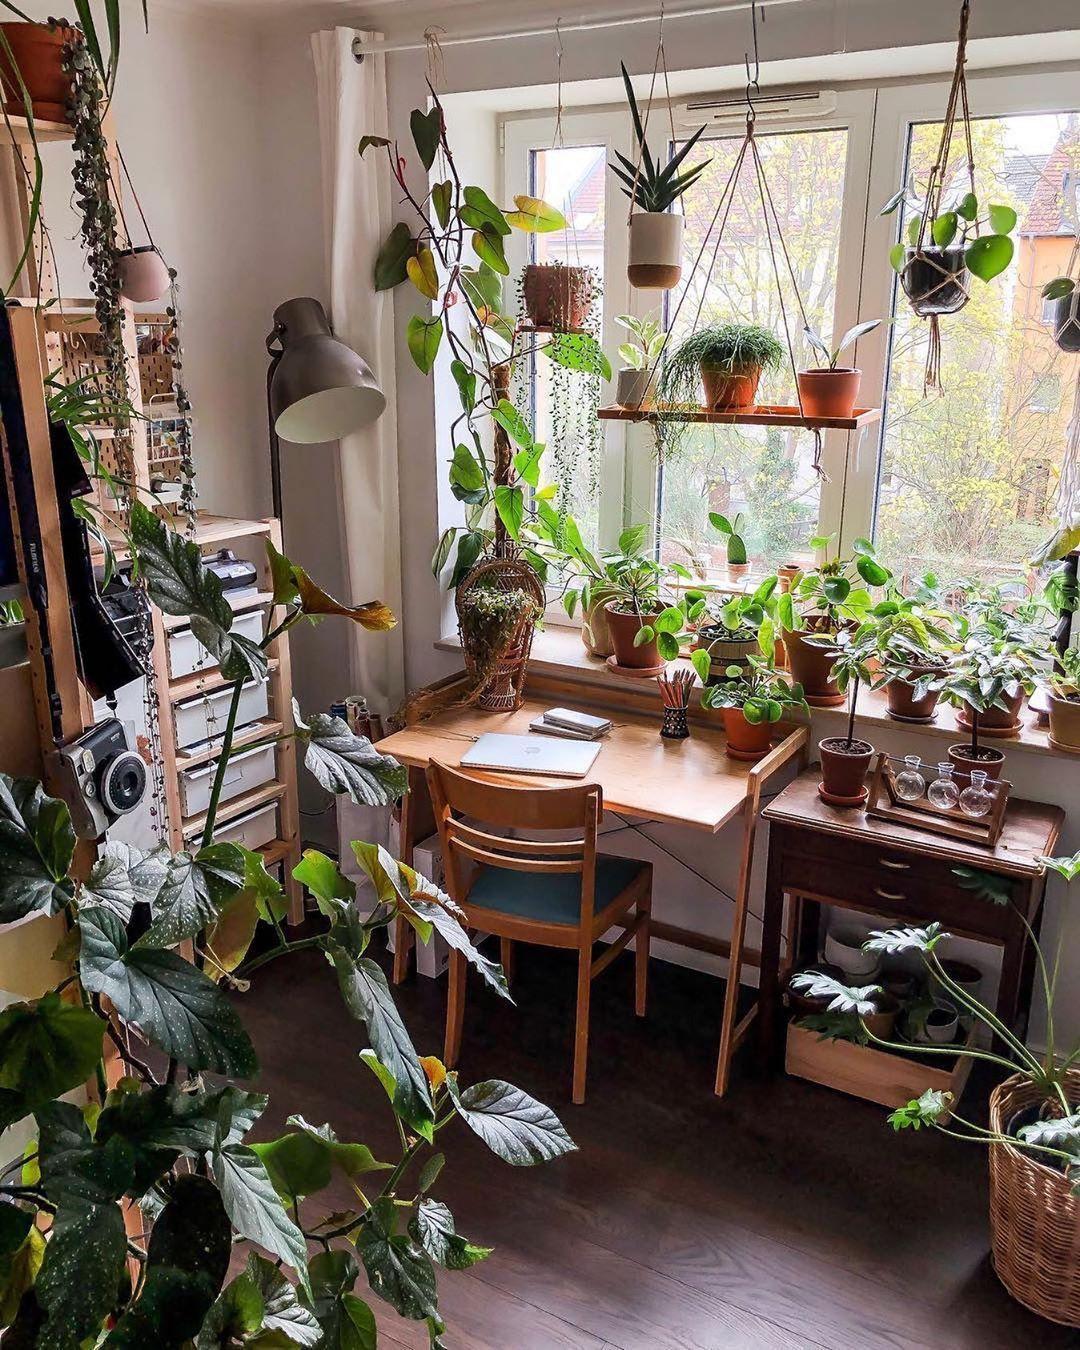 Pin on Indoor Plants Decor